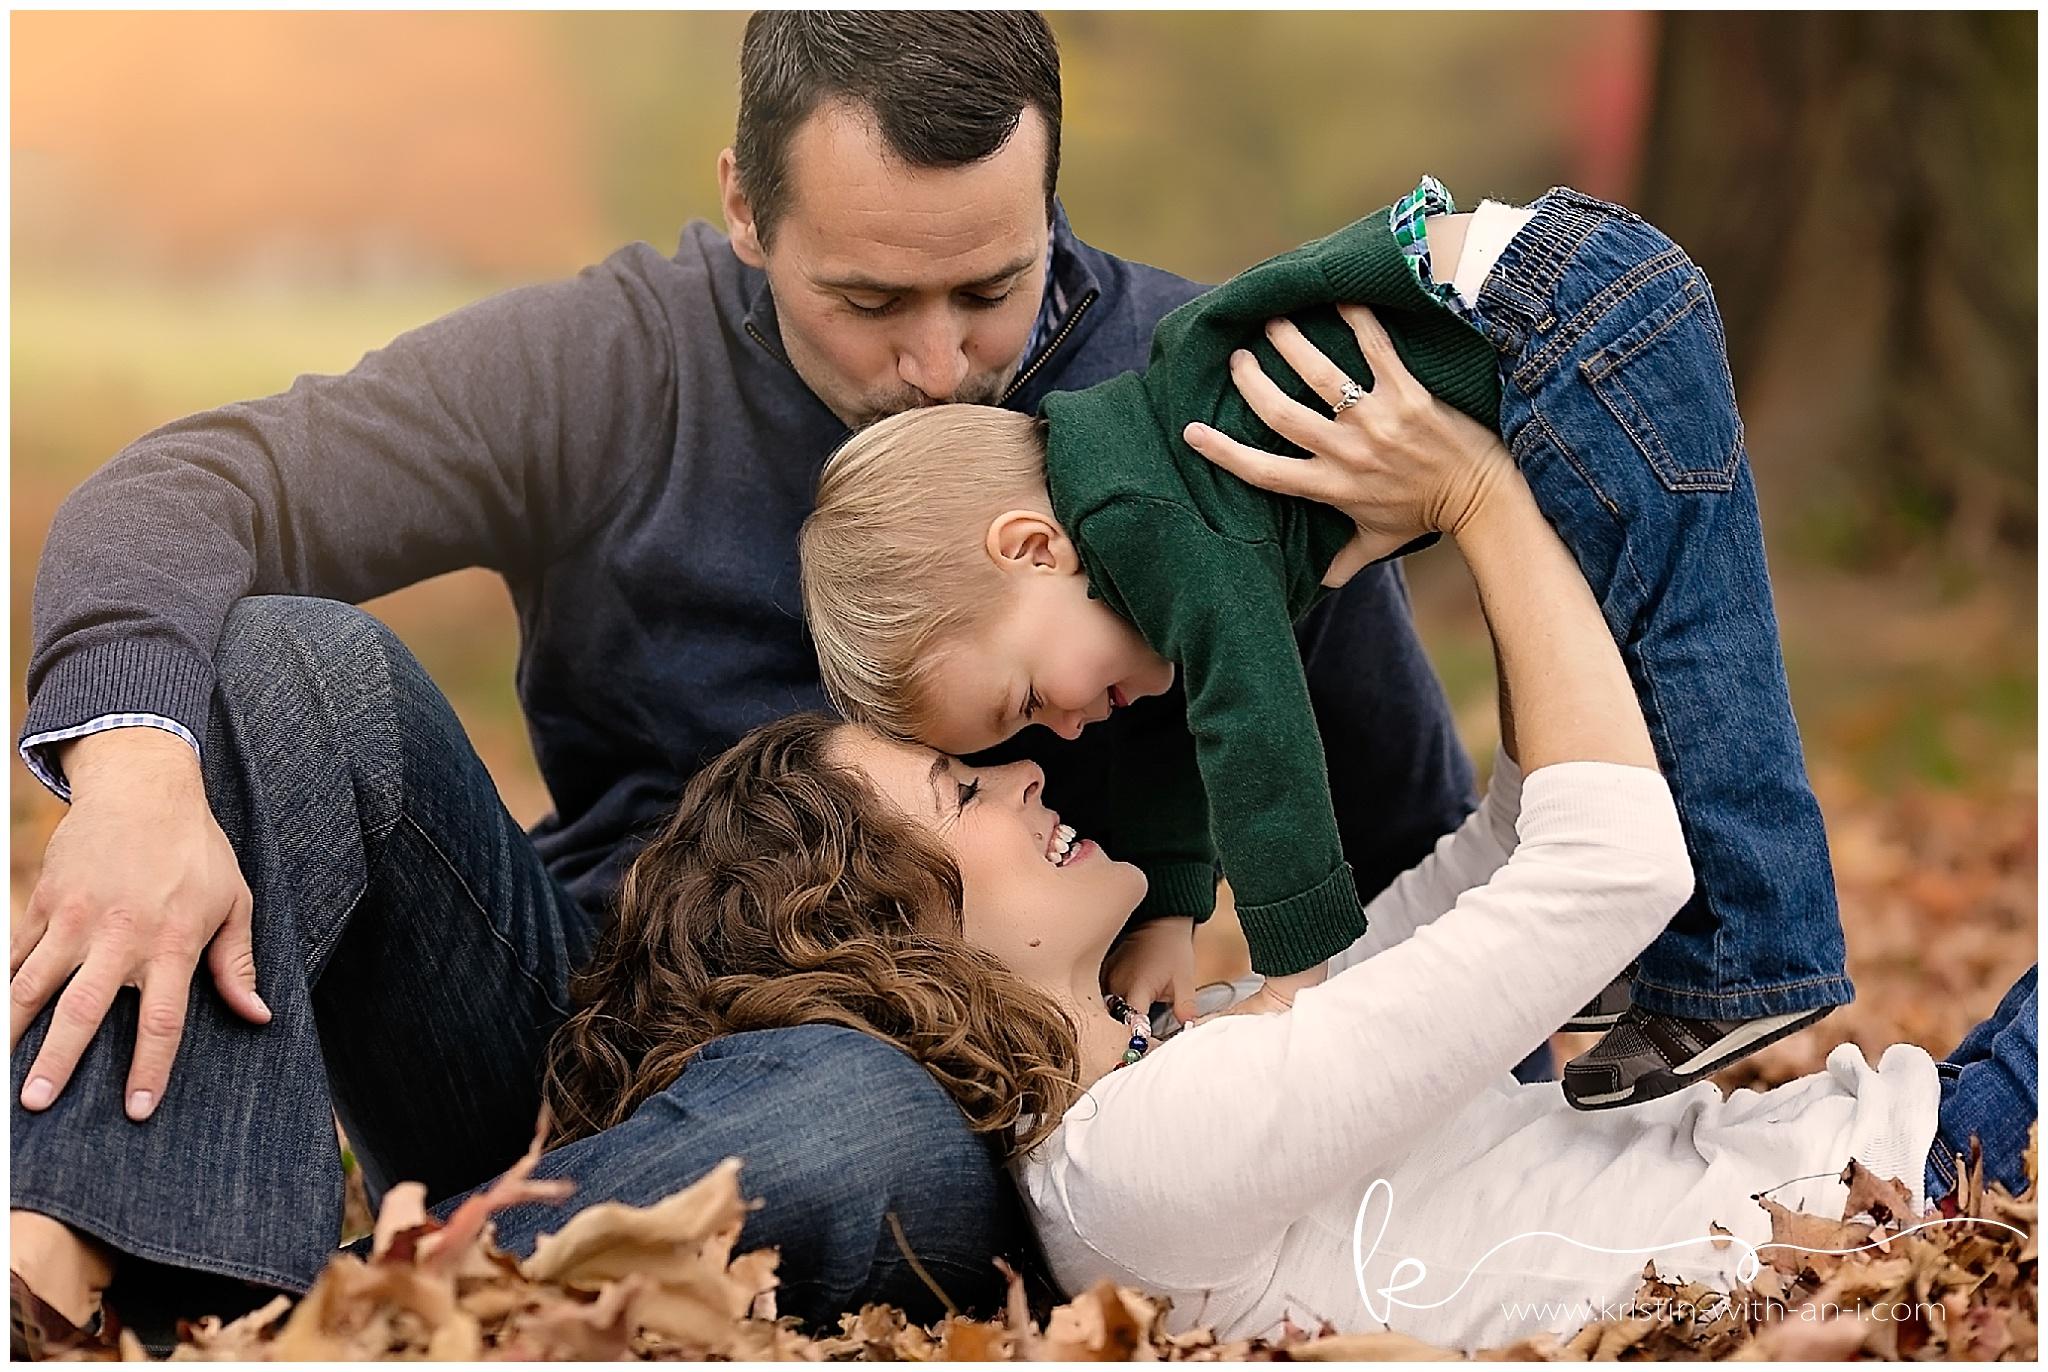 Lehigh Valley Family Photographer Allentown Family Photographer Bethlehem Family Photographer Philadelphia Family Photographer